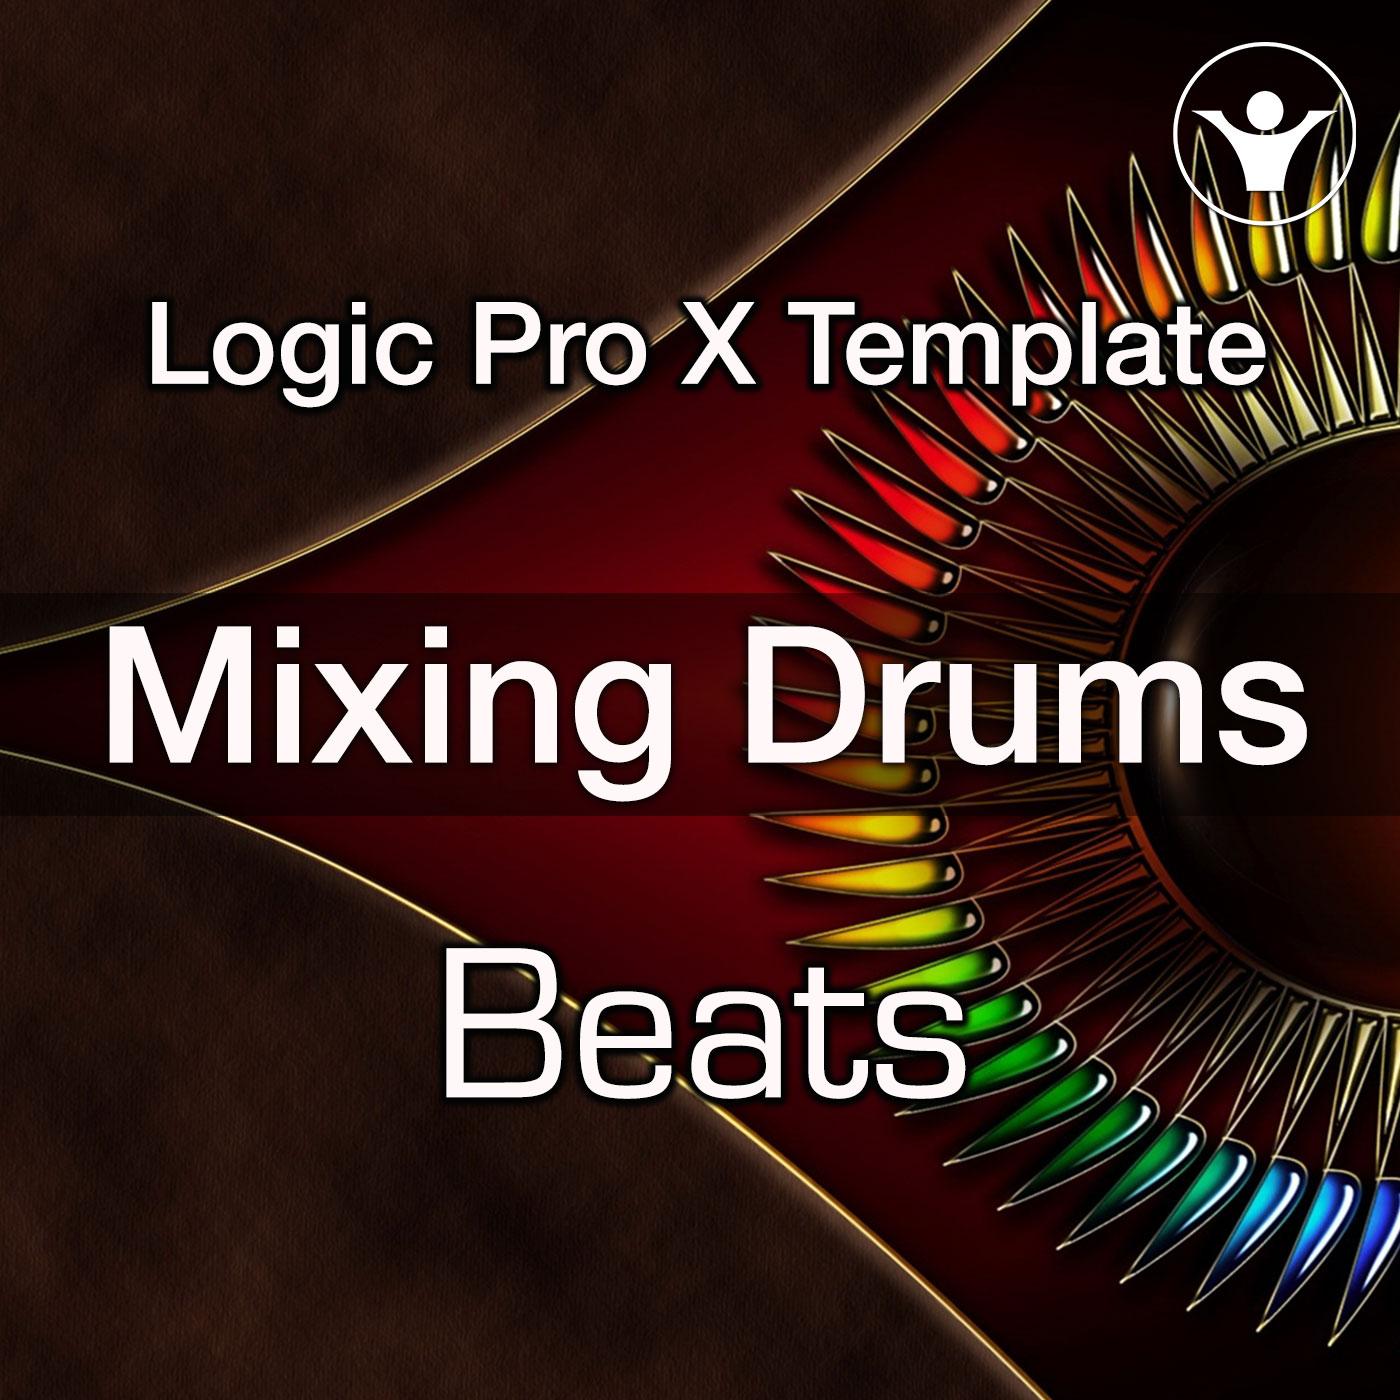 Mixing Drums Logic Pro X Logic Pro X Template